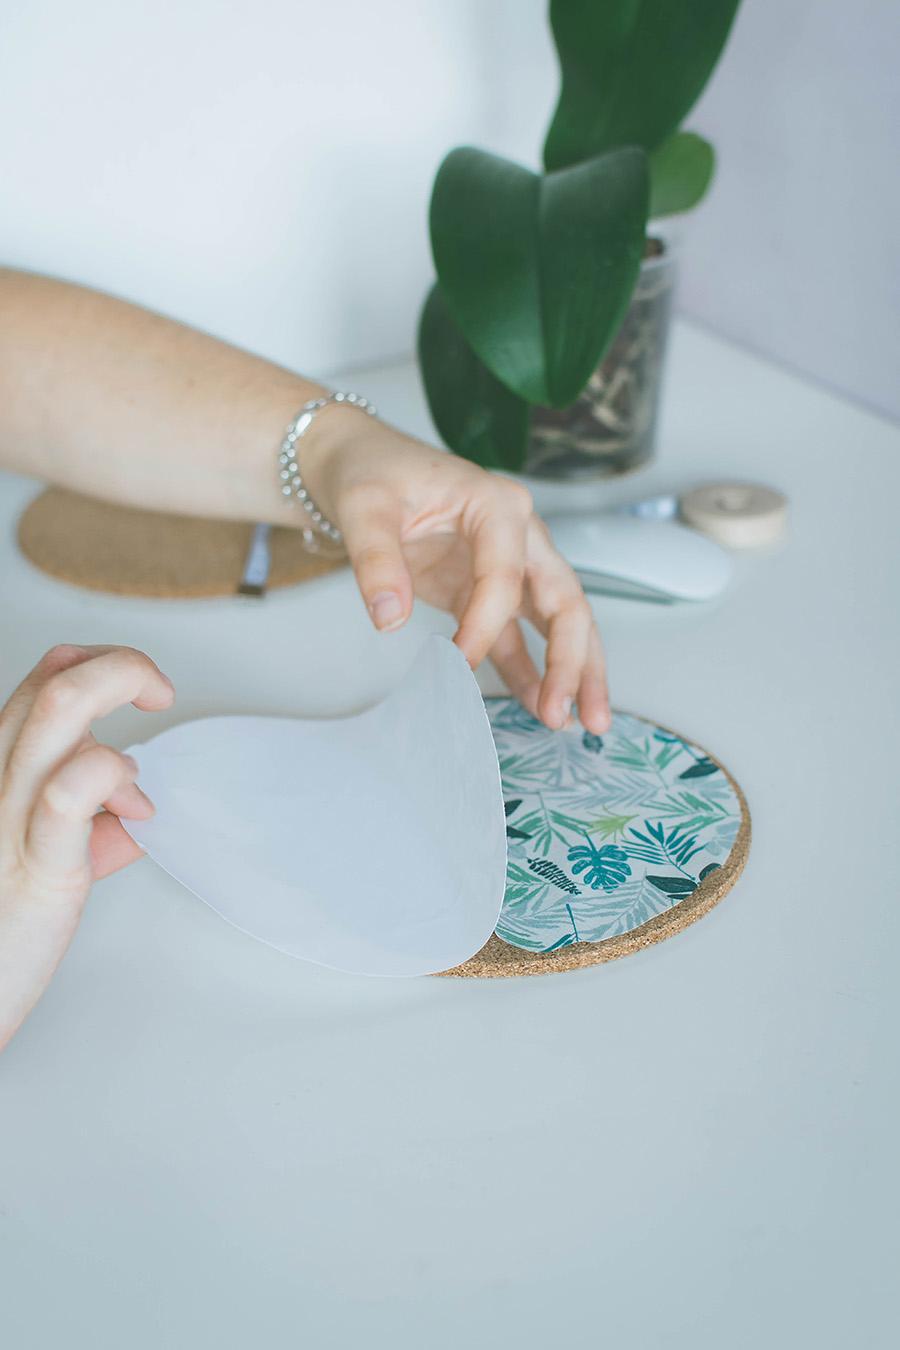 DIY Pattern Mouse Pad Tutorial Step 3